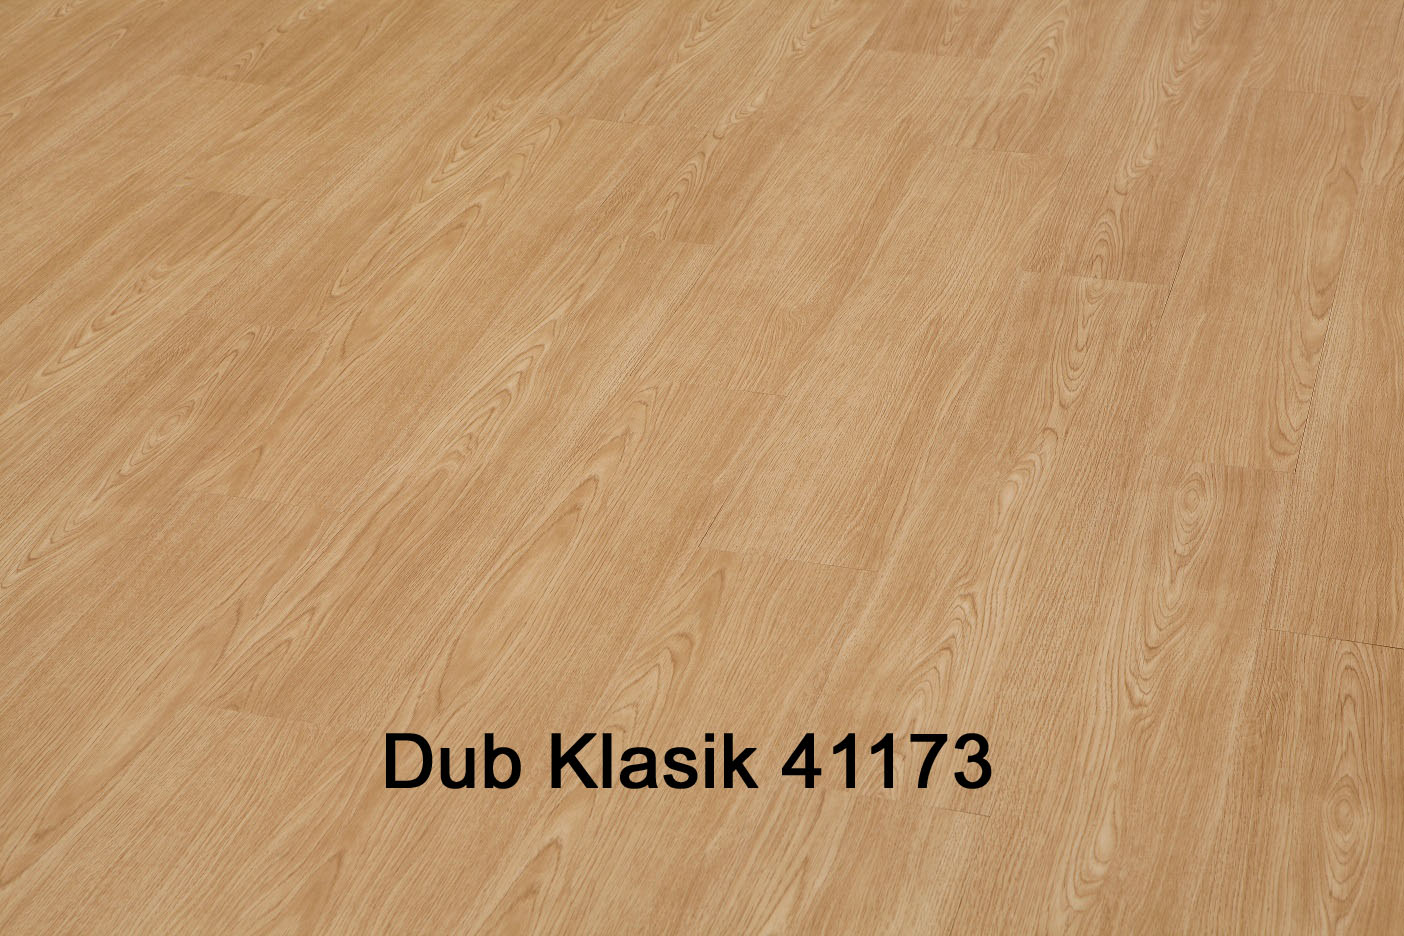 Dub_Klasik